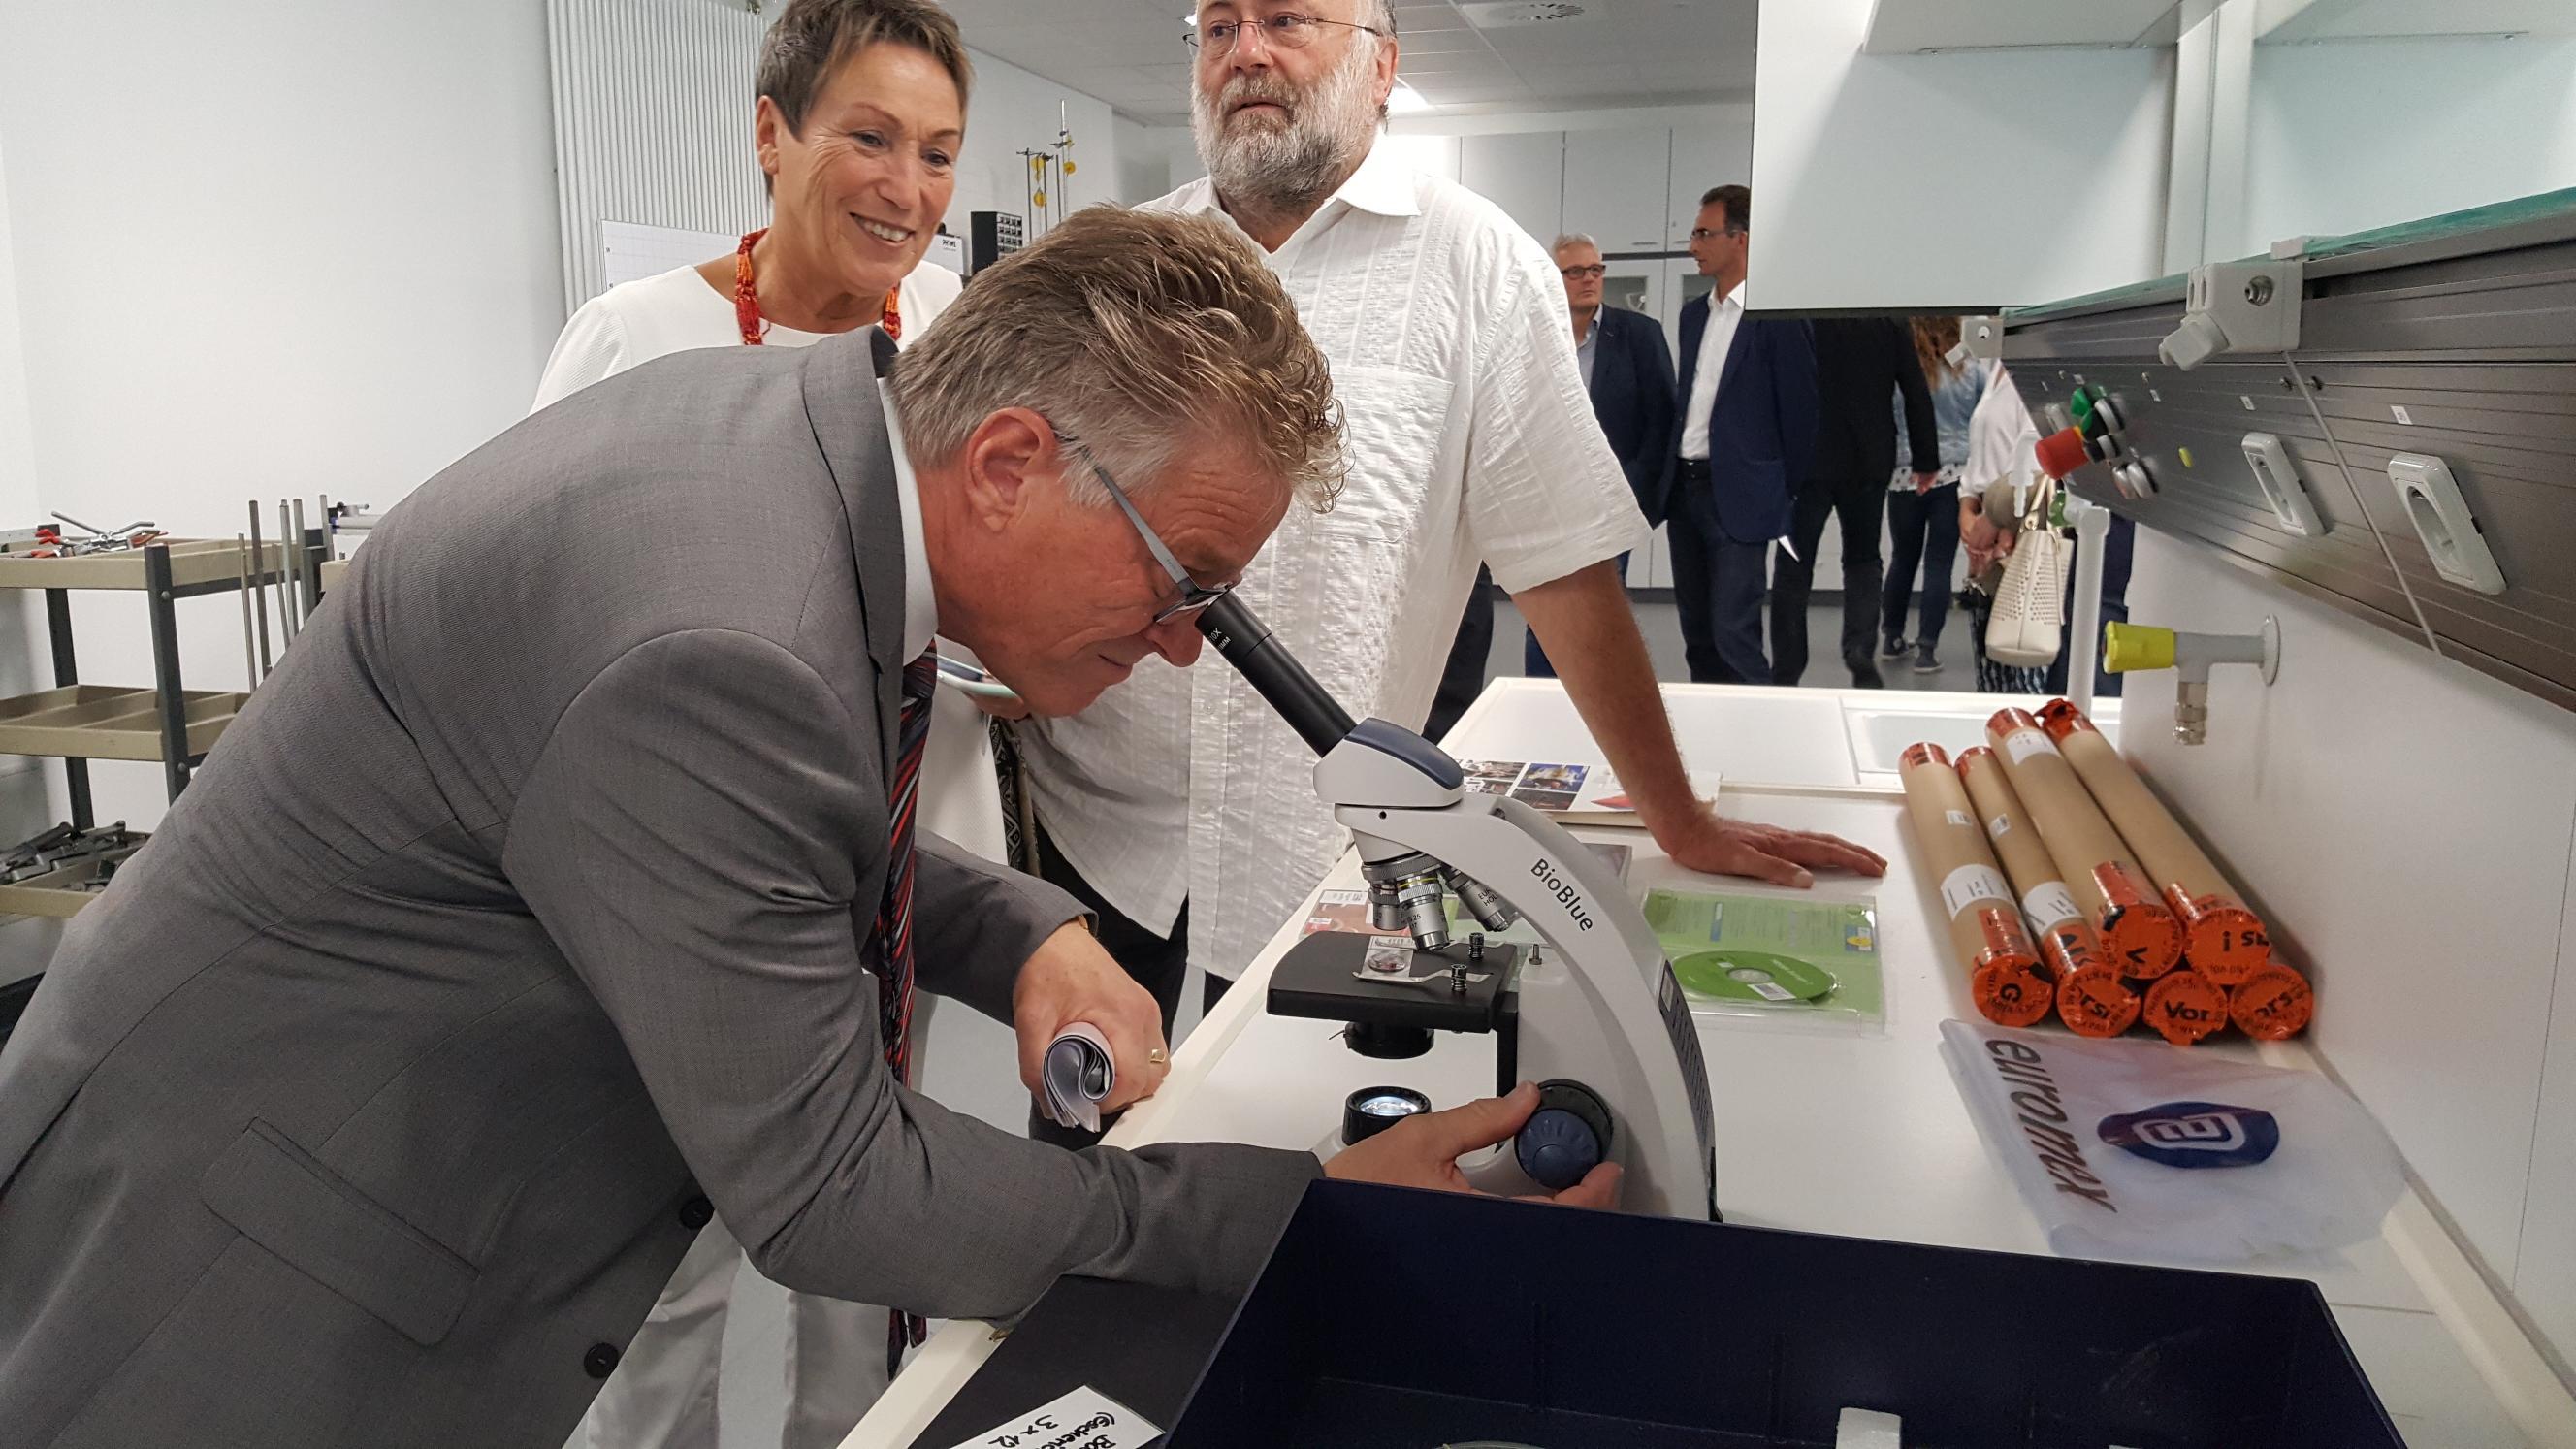 Kreisbeigeordneter Winfried Ottmann beim Mikroskopieren